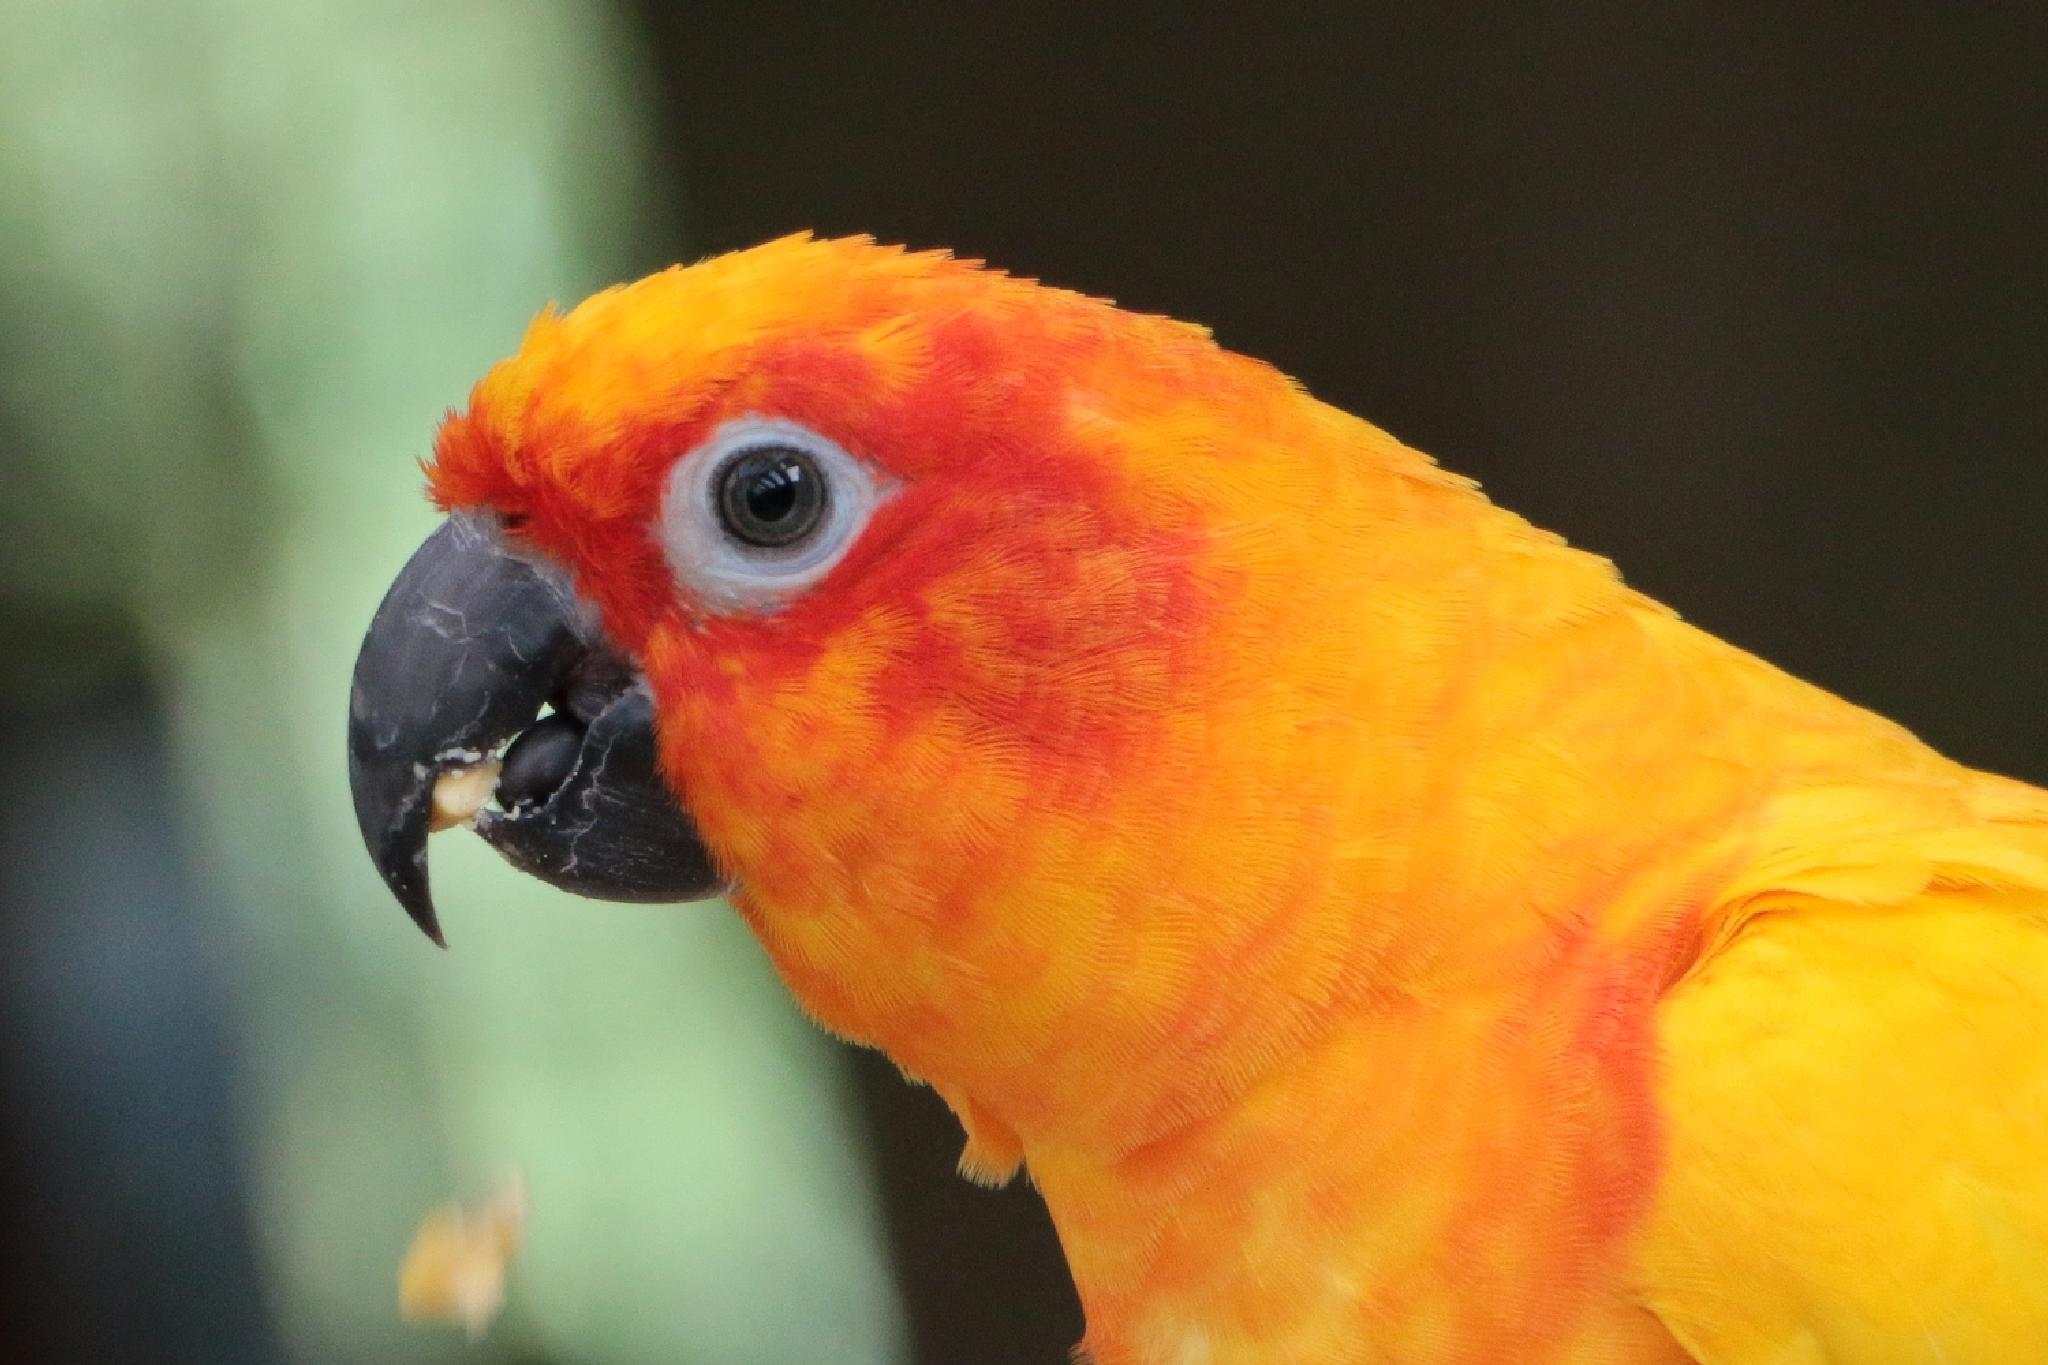 Orange and Yellow Parrot up close by Jo-Ann de Smit